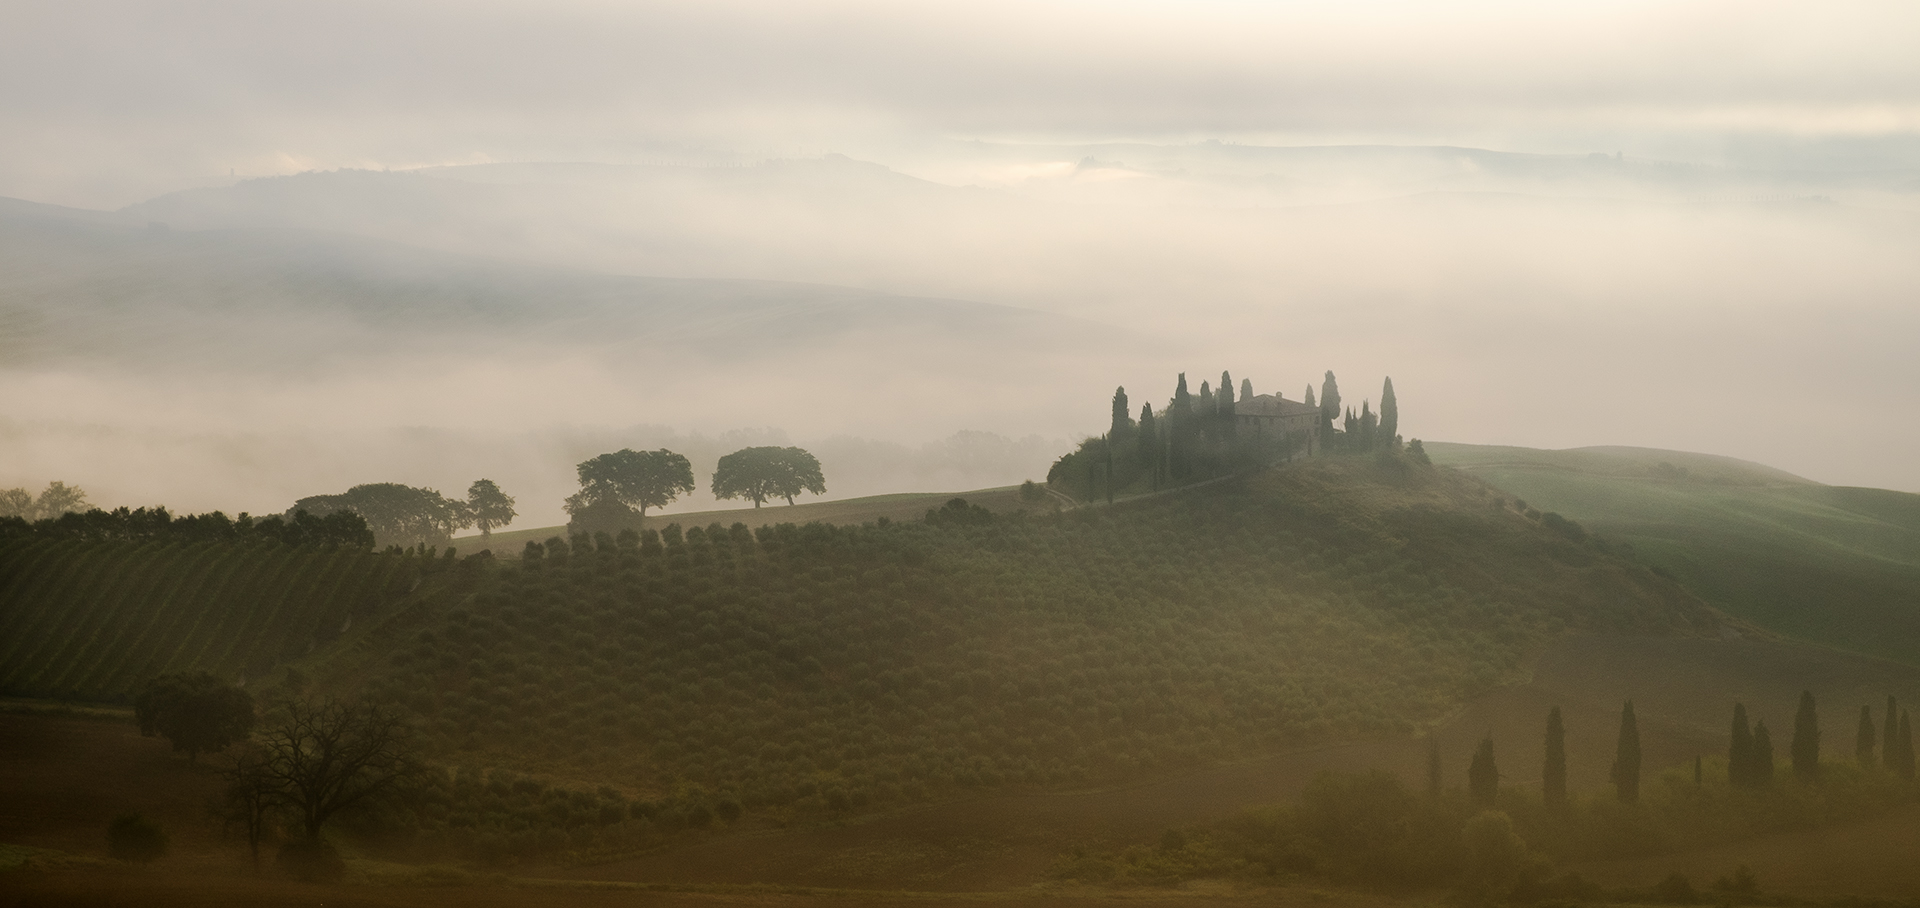 Joint 3rd - 18 points - Dawn Mist Behind the Belvedere Elizabeth Restall, ARPS